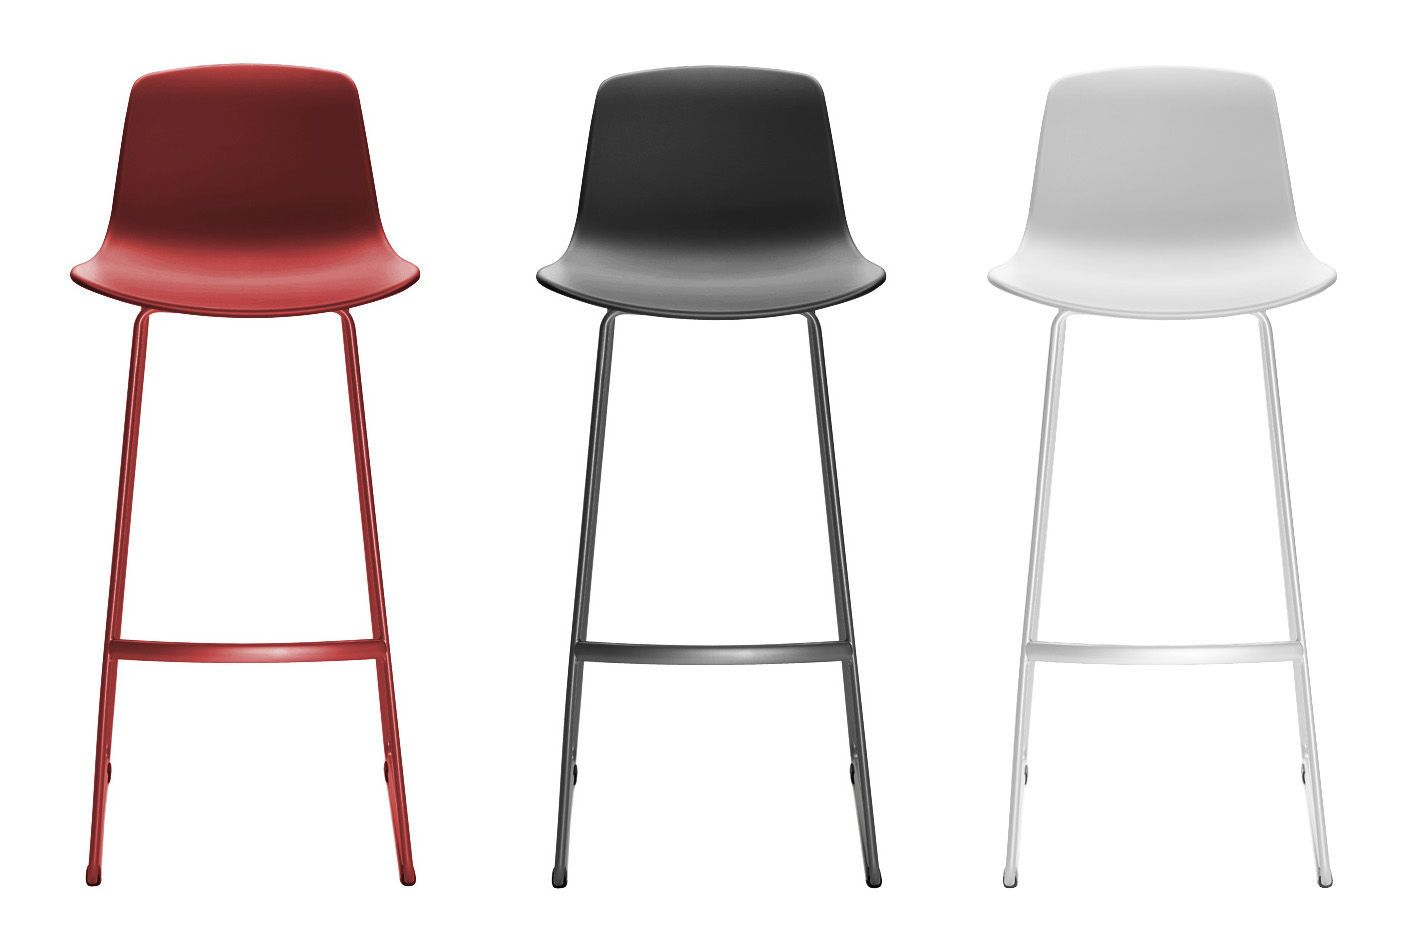 Lottus Enea Convivialite Chaise Bar Chaise De Bar Design Tabouret De Bar